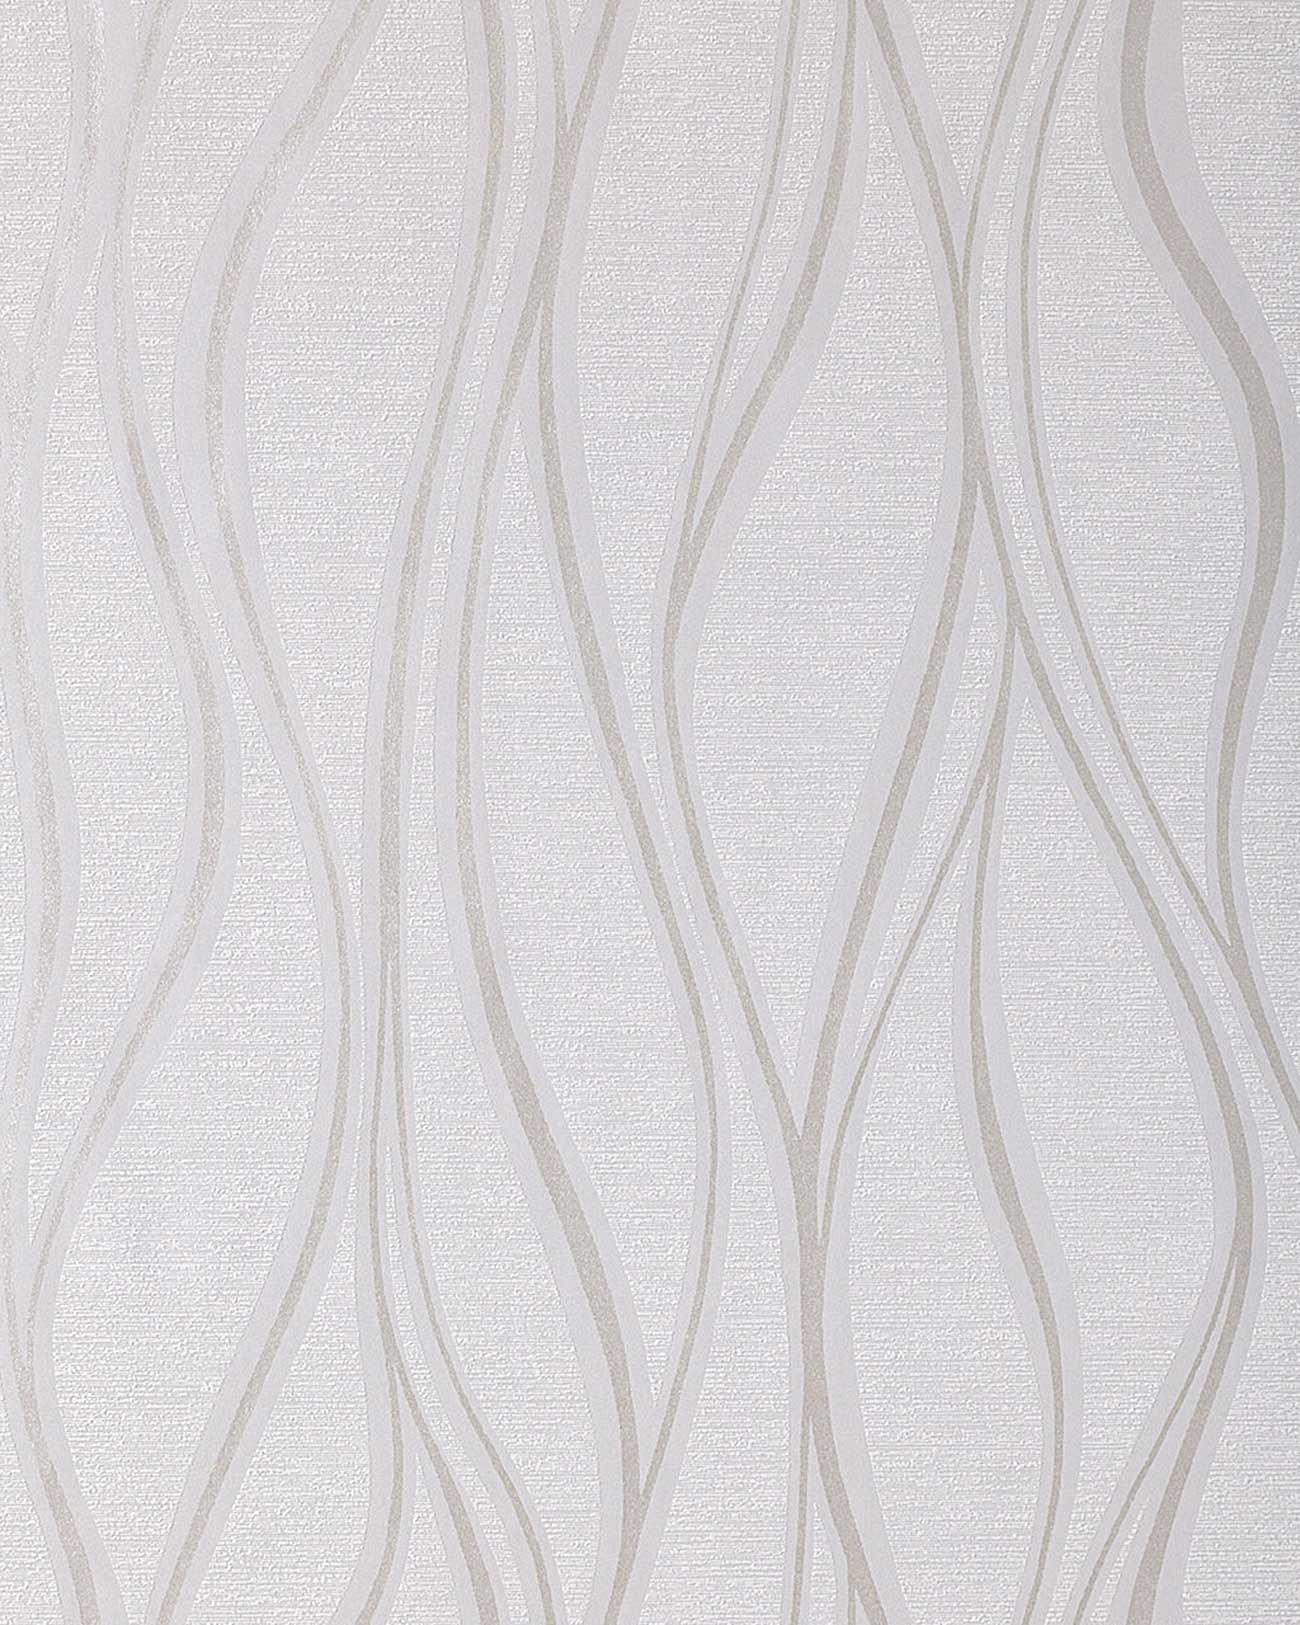 Stripe vinyl wallpaper wall EDEM 147 02 light grey white silver grey 1300x1625